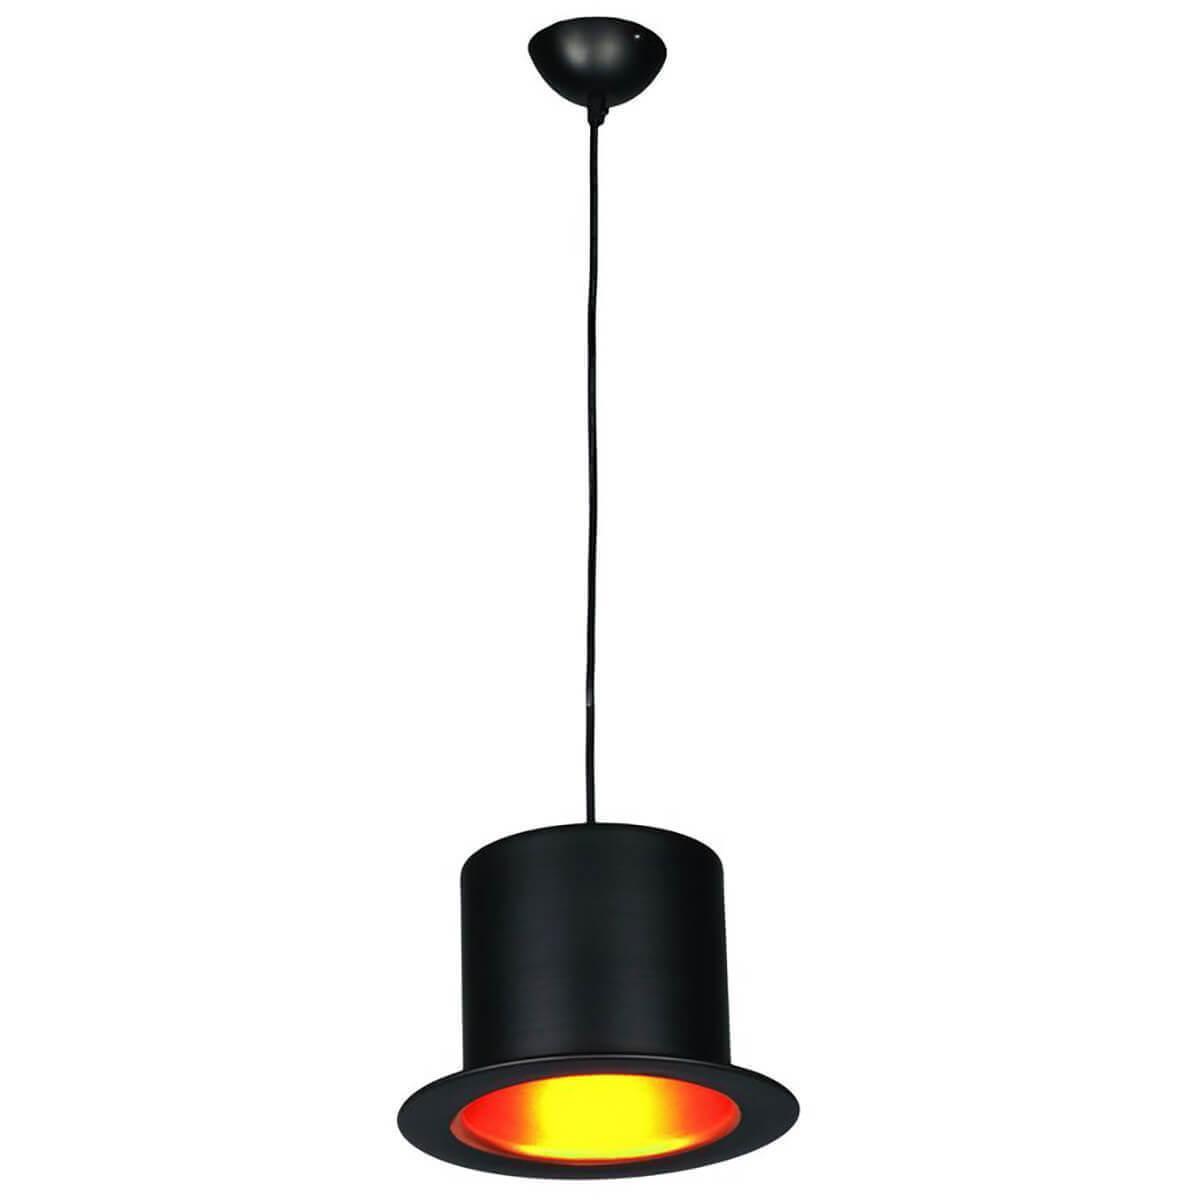 Подвесной светильник Omnilux OML-34616-01, E27, 40 Вт